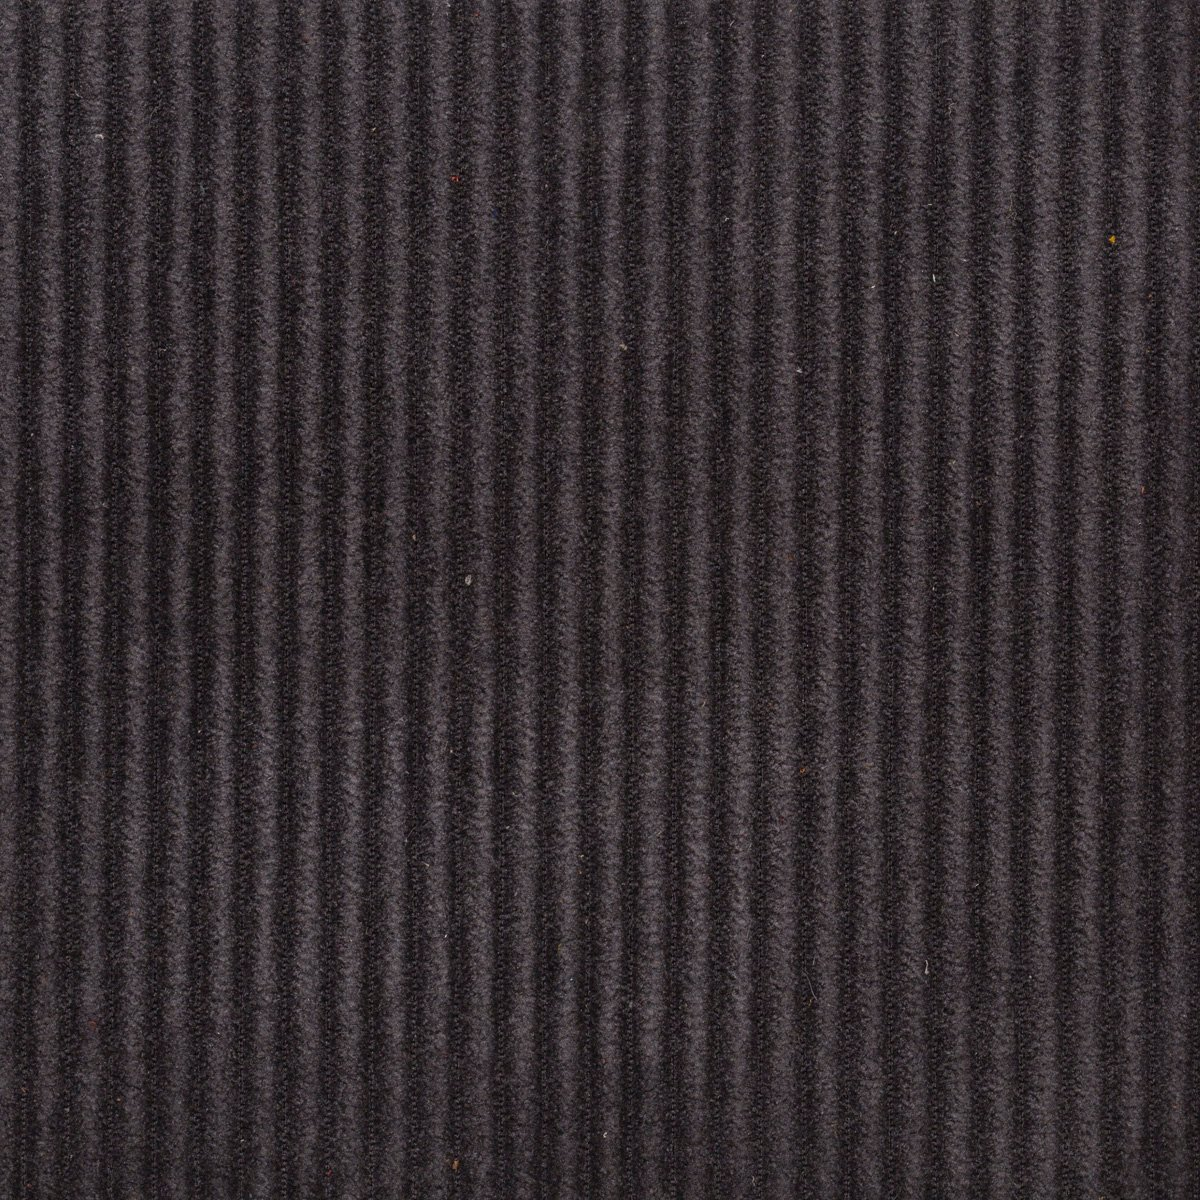 J.FitzPatrick Footwear Grey Corduroy Fabric